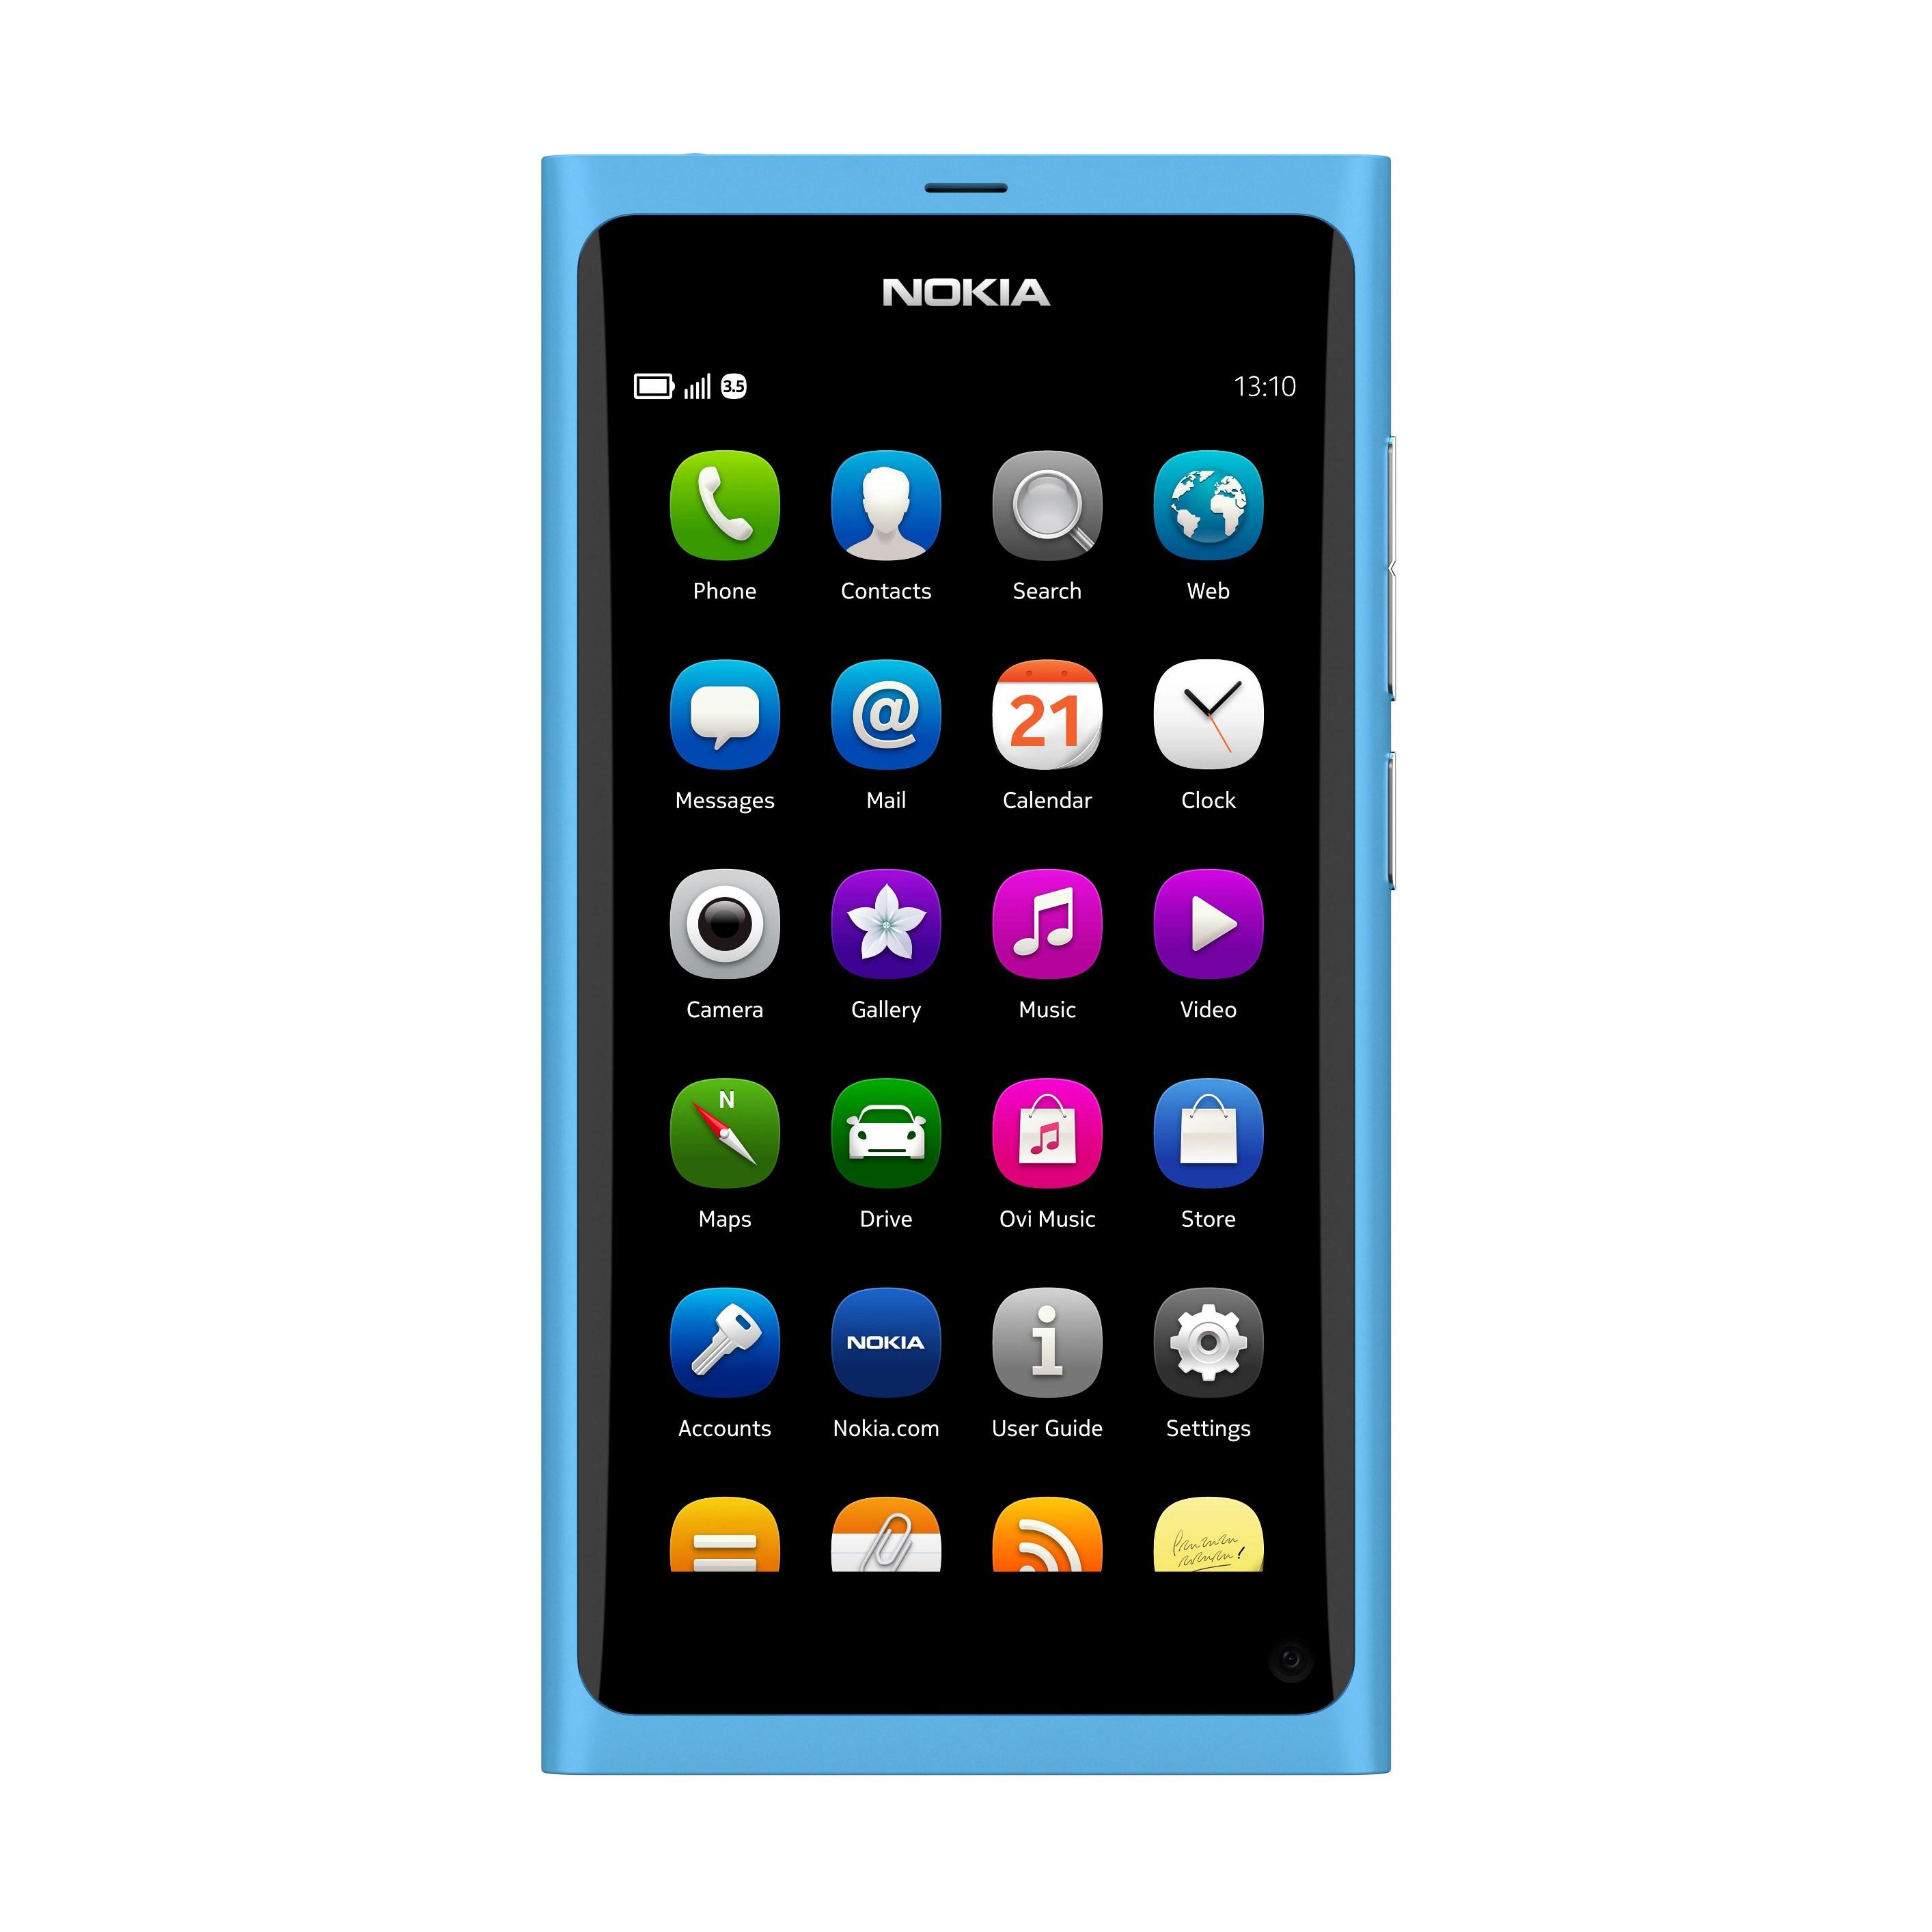 Nokia N9 zaprezentowana